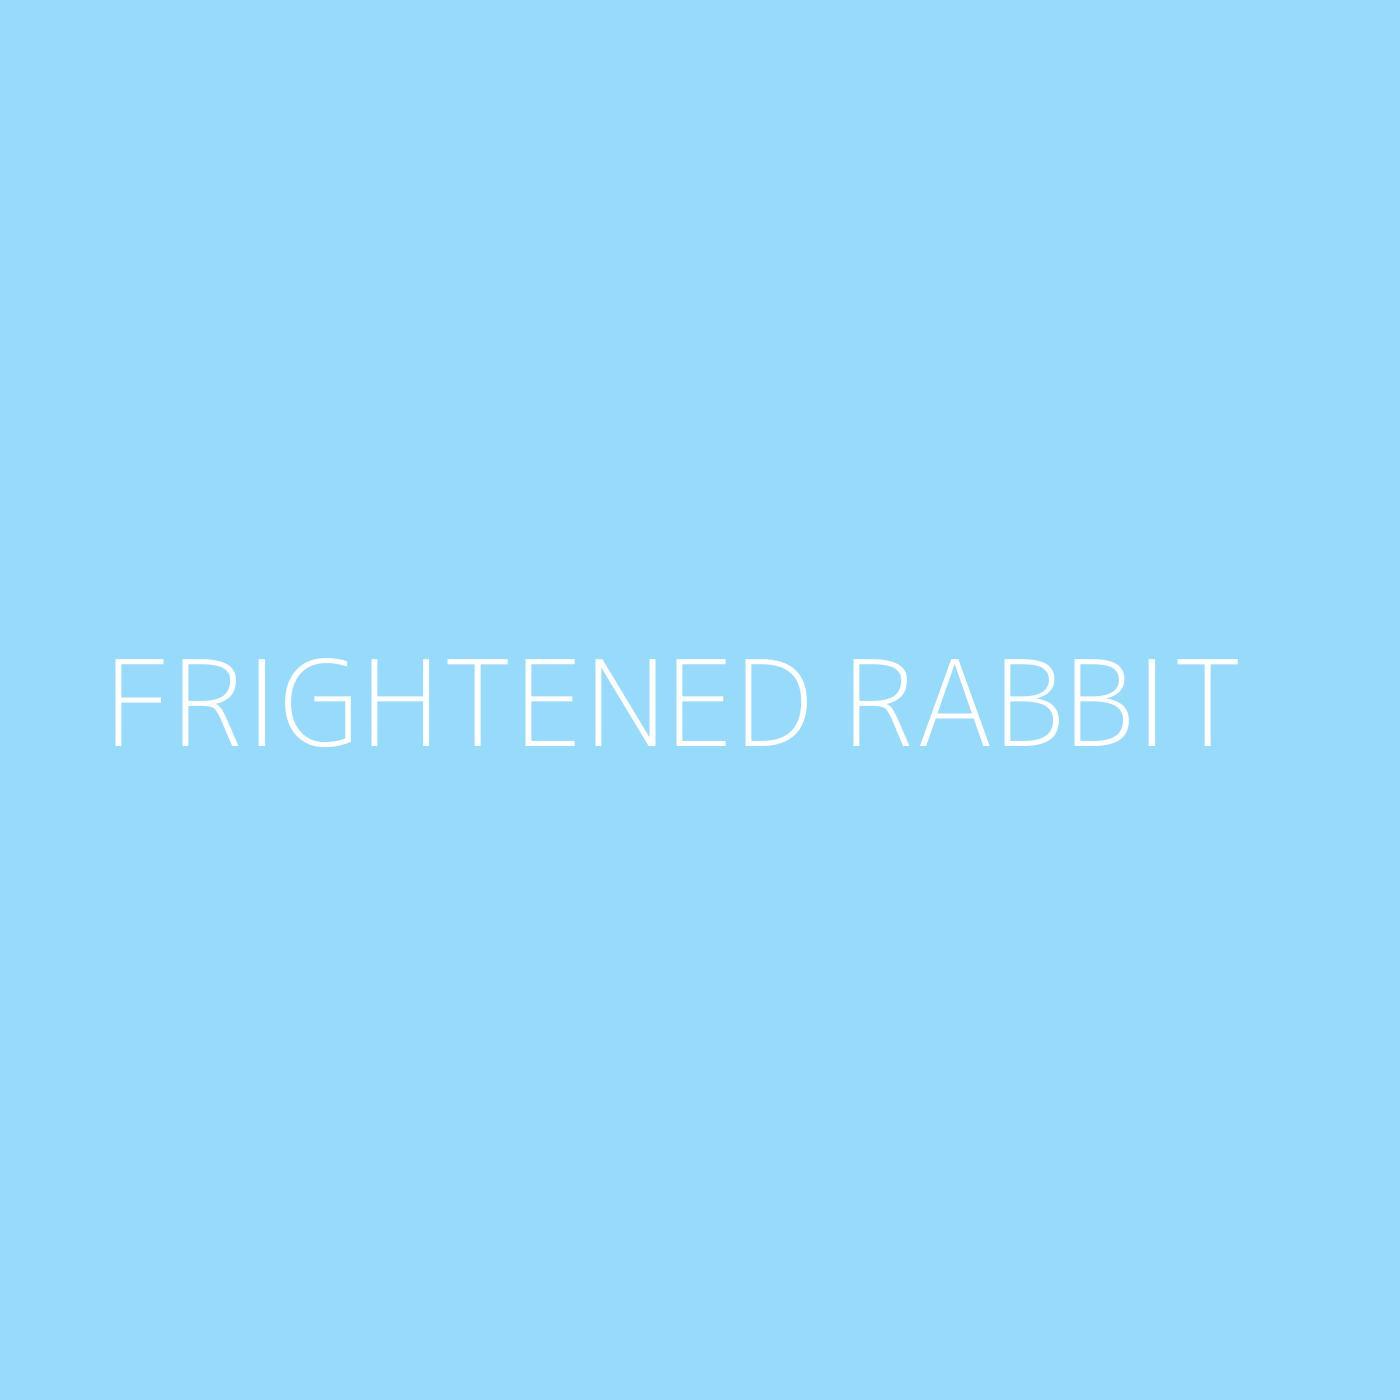 Frightened Rabbit Playlist Artwork